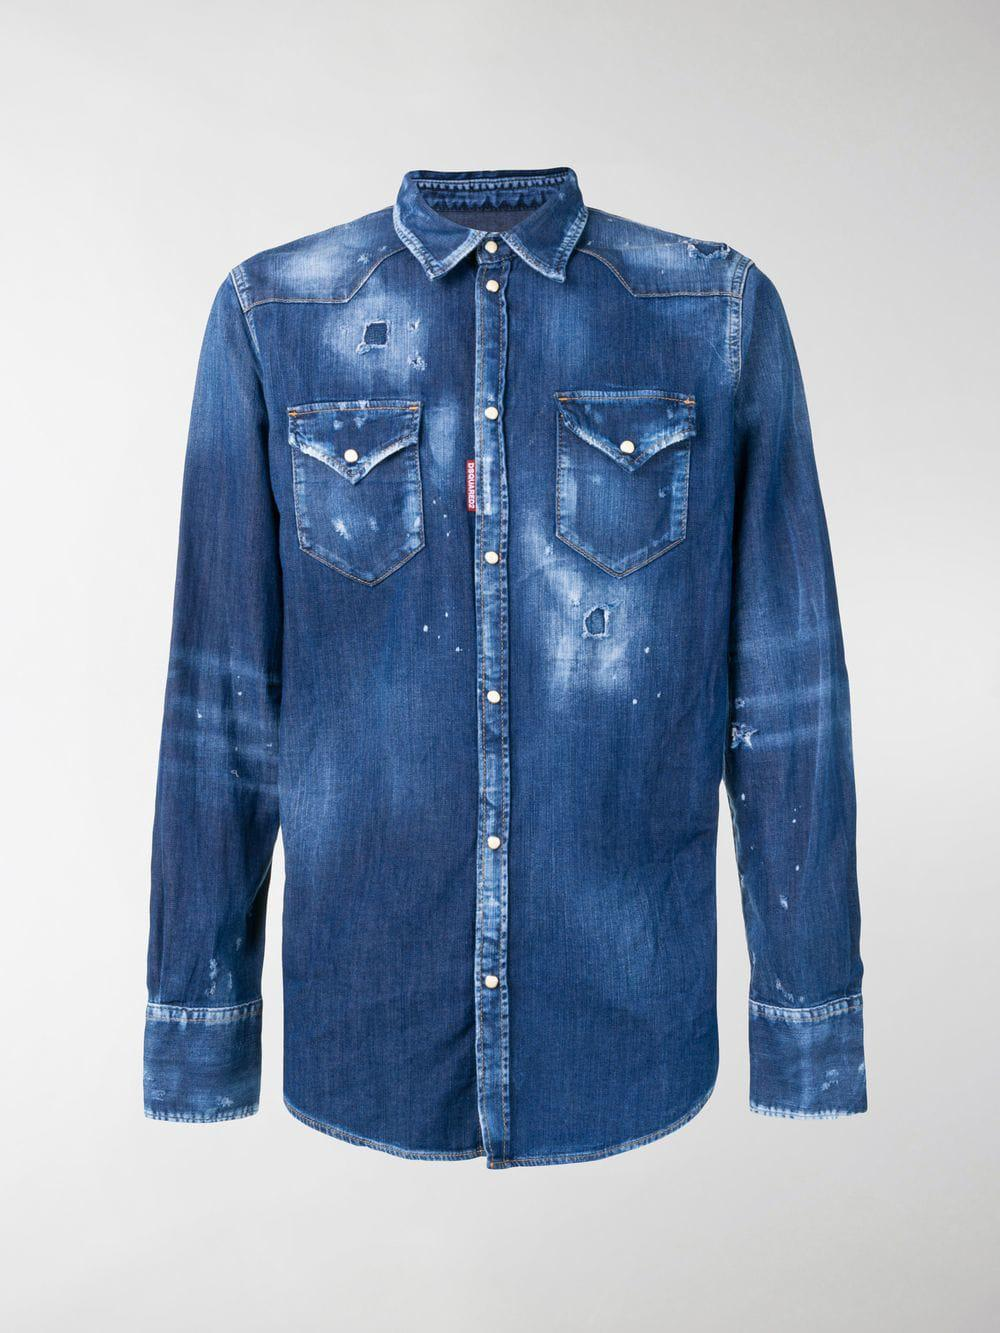 85e63ff12d Lyst - Dsquared² Distressed Denim Shirt in Blue for Men